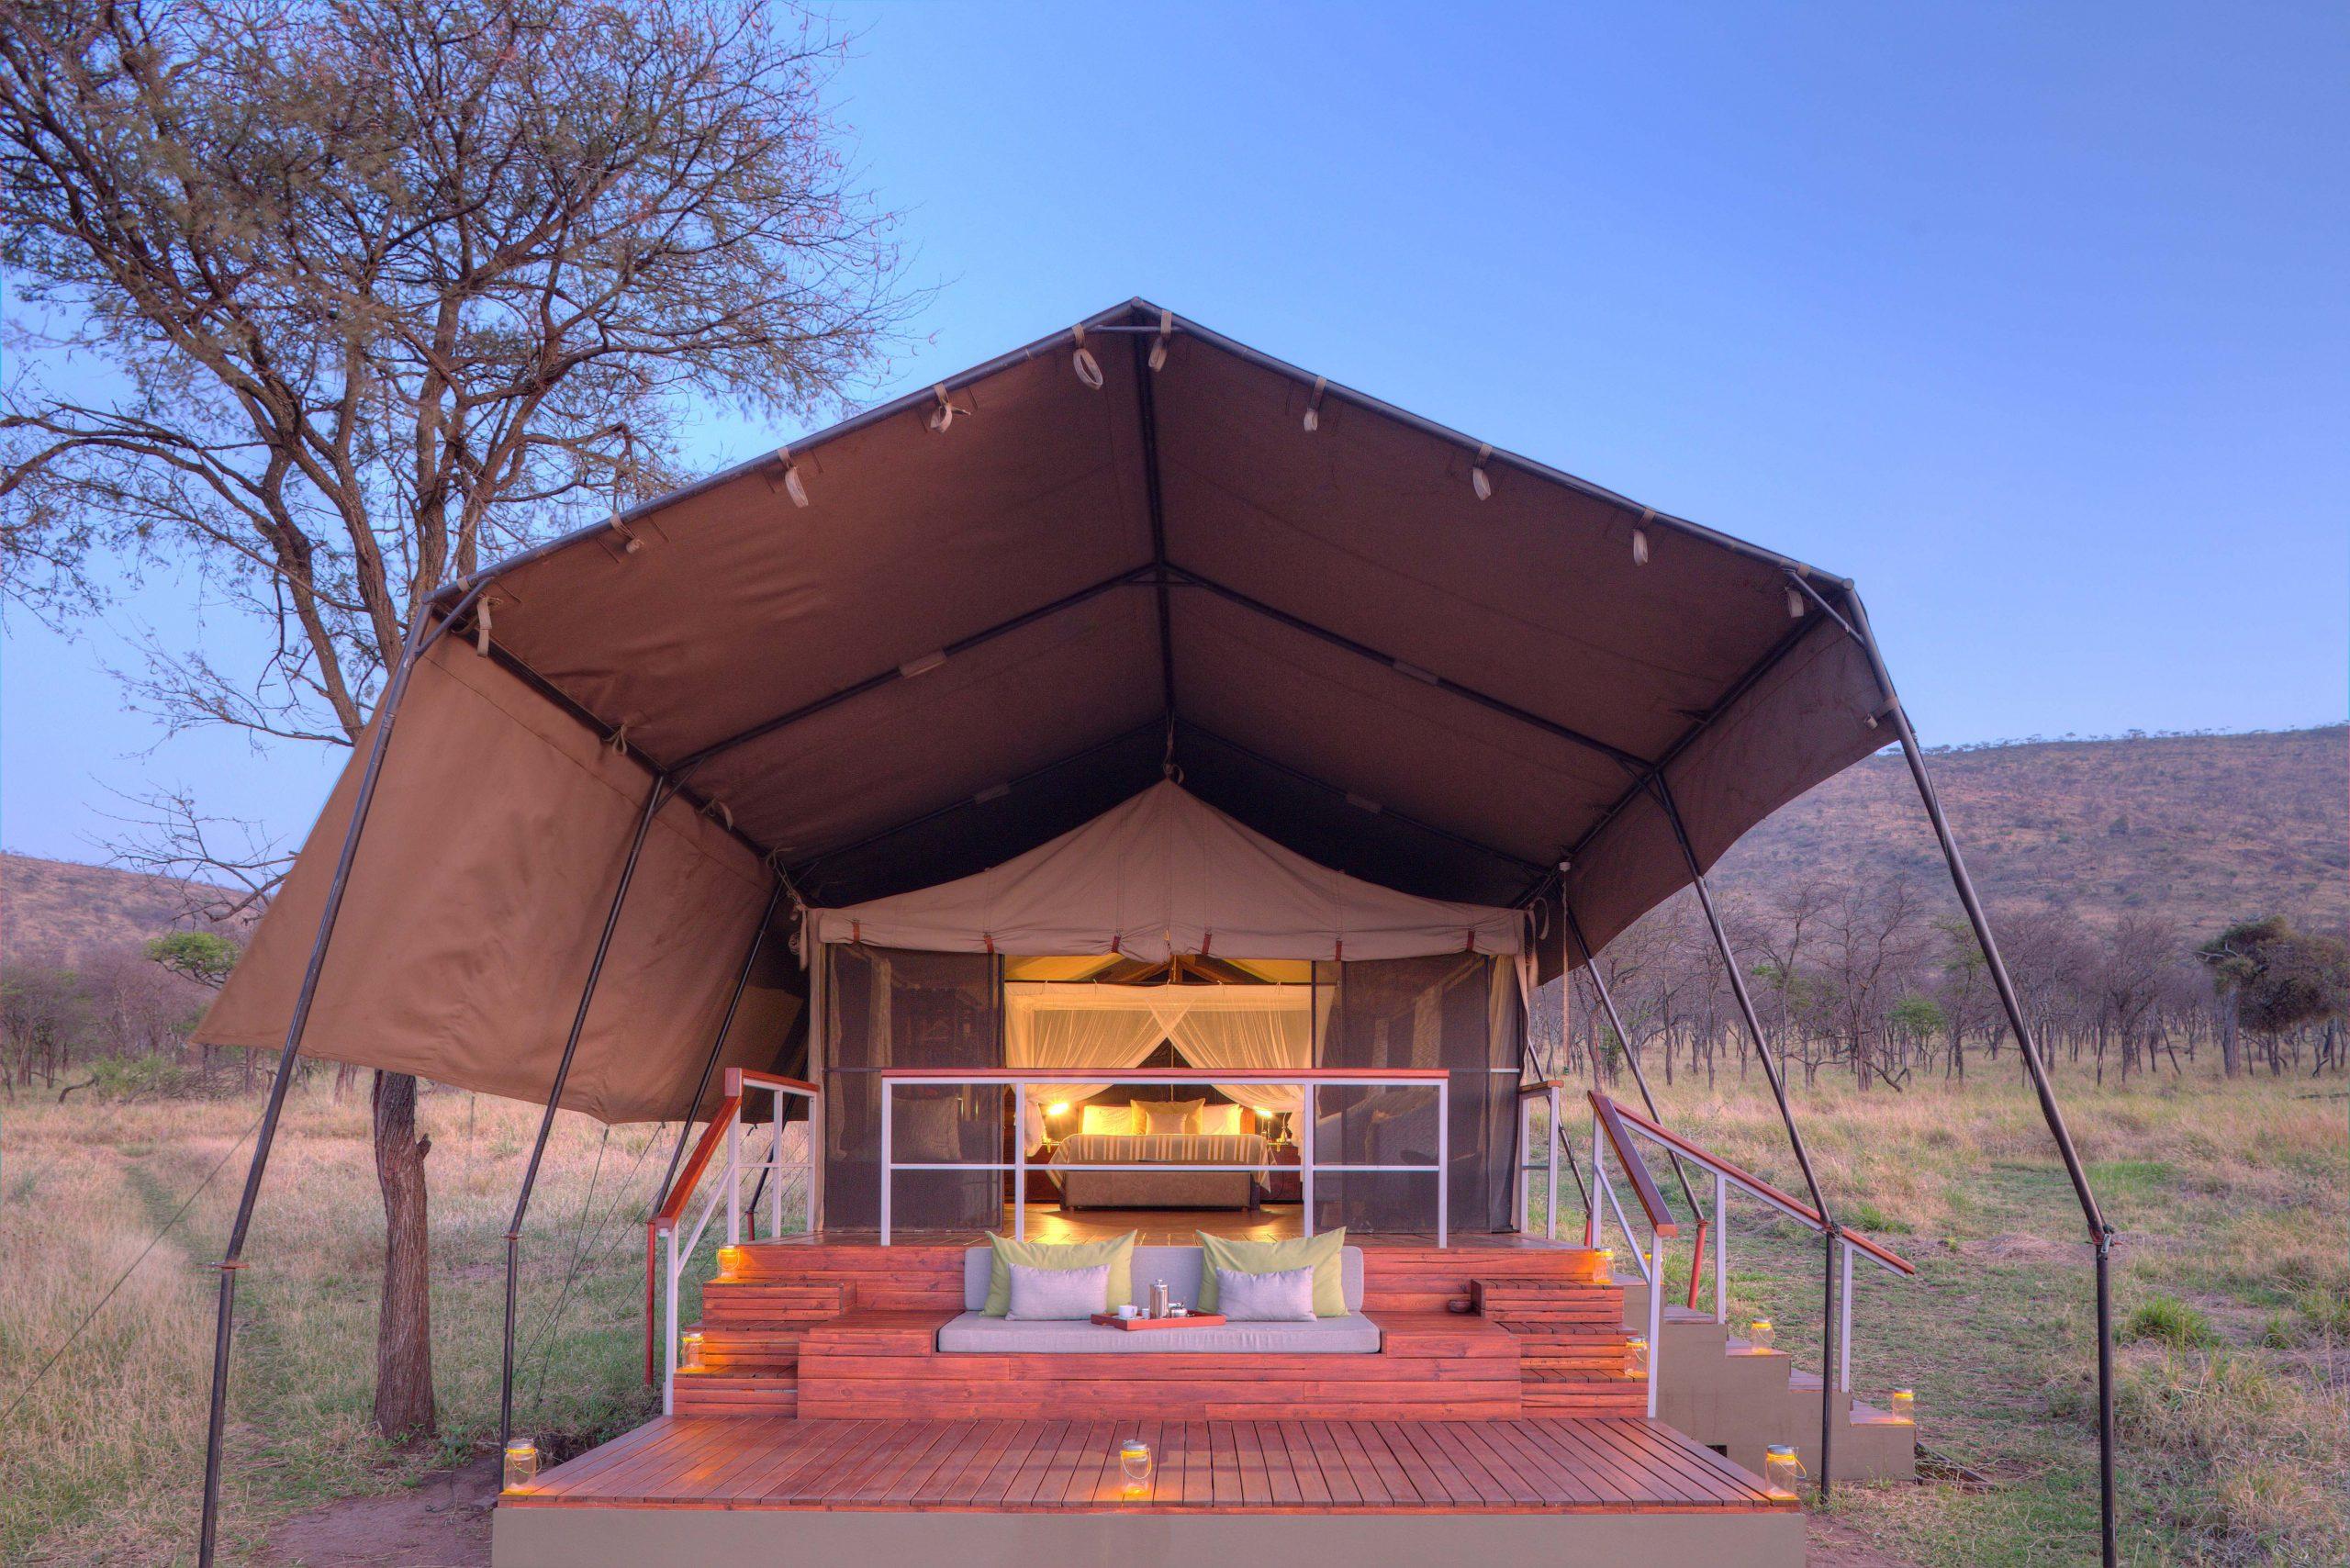 Dunia - Tent exterior - Asilia